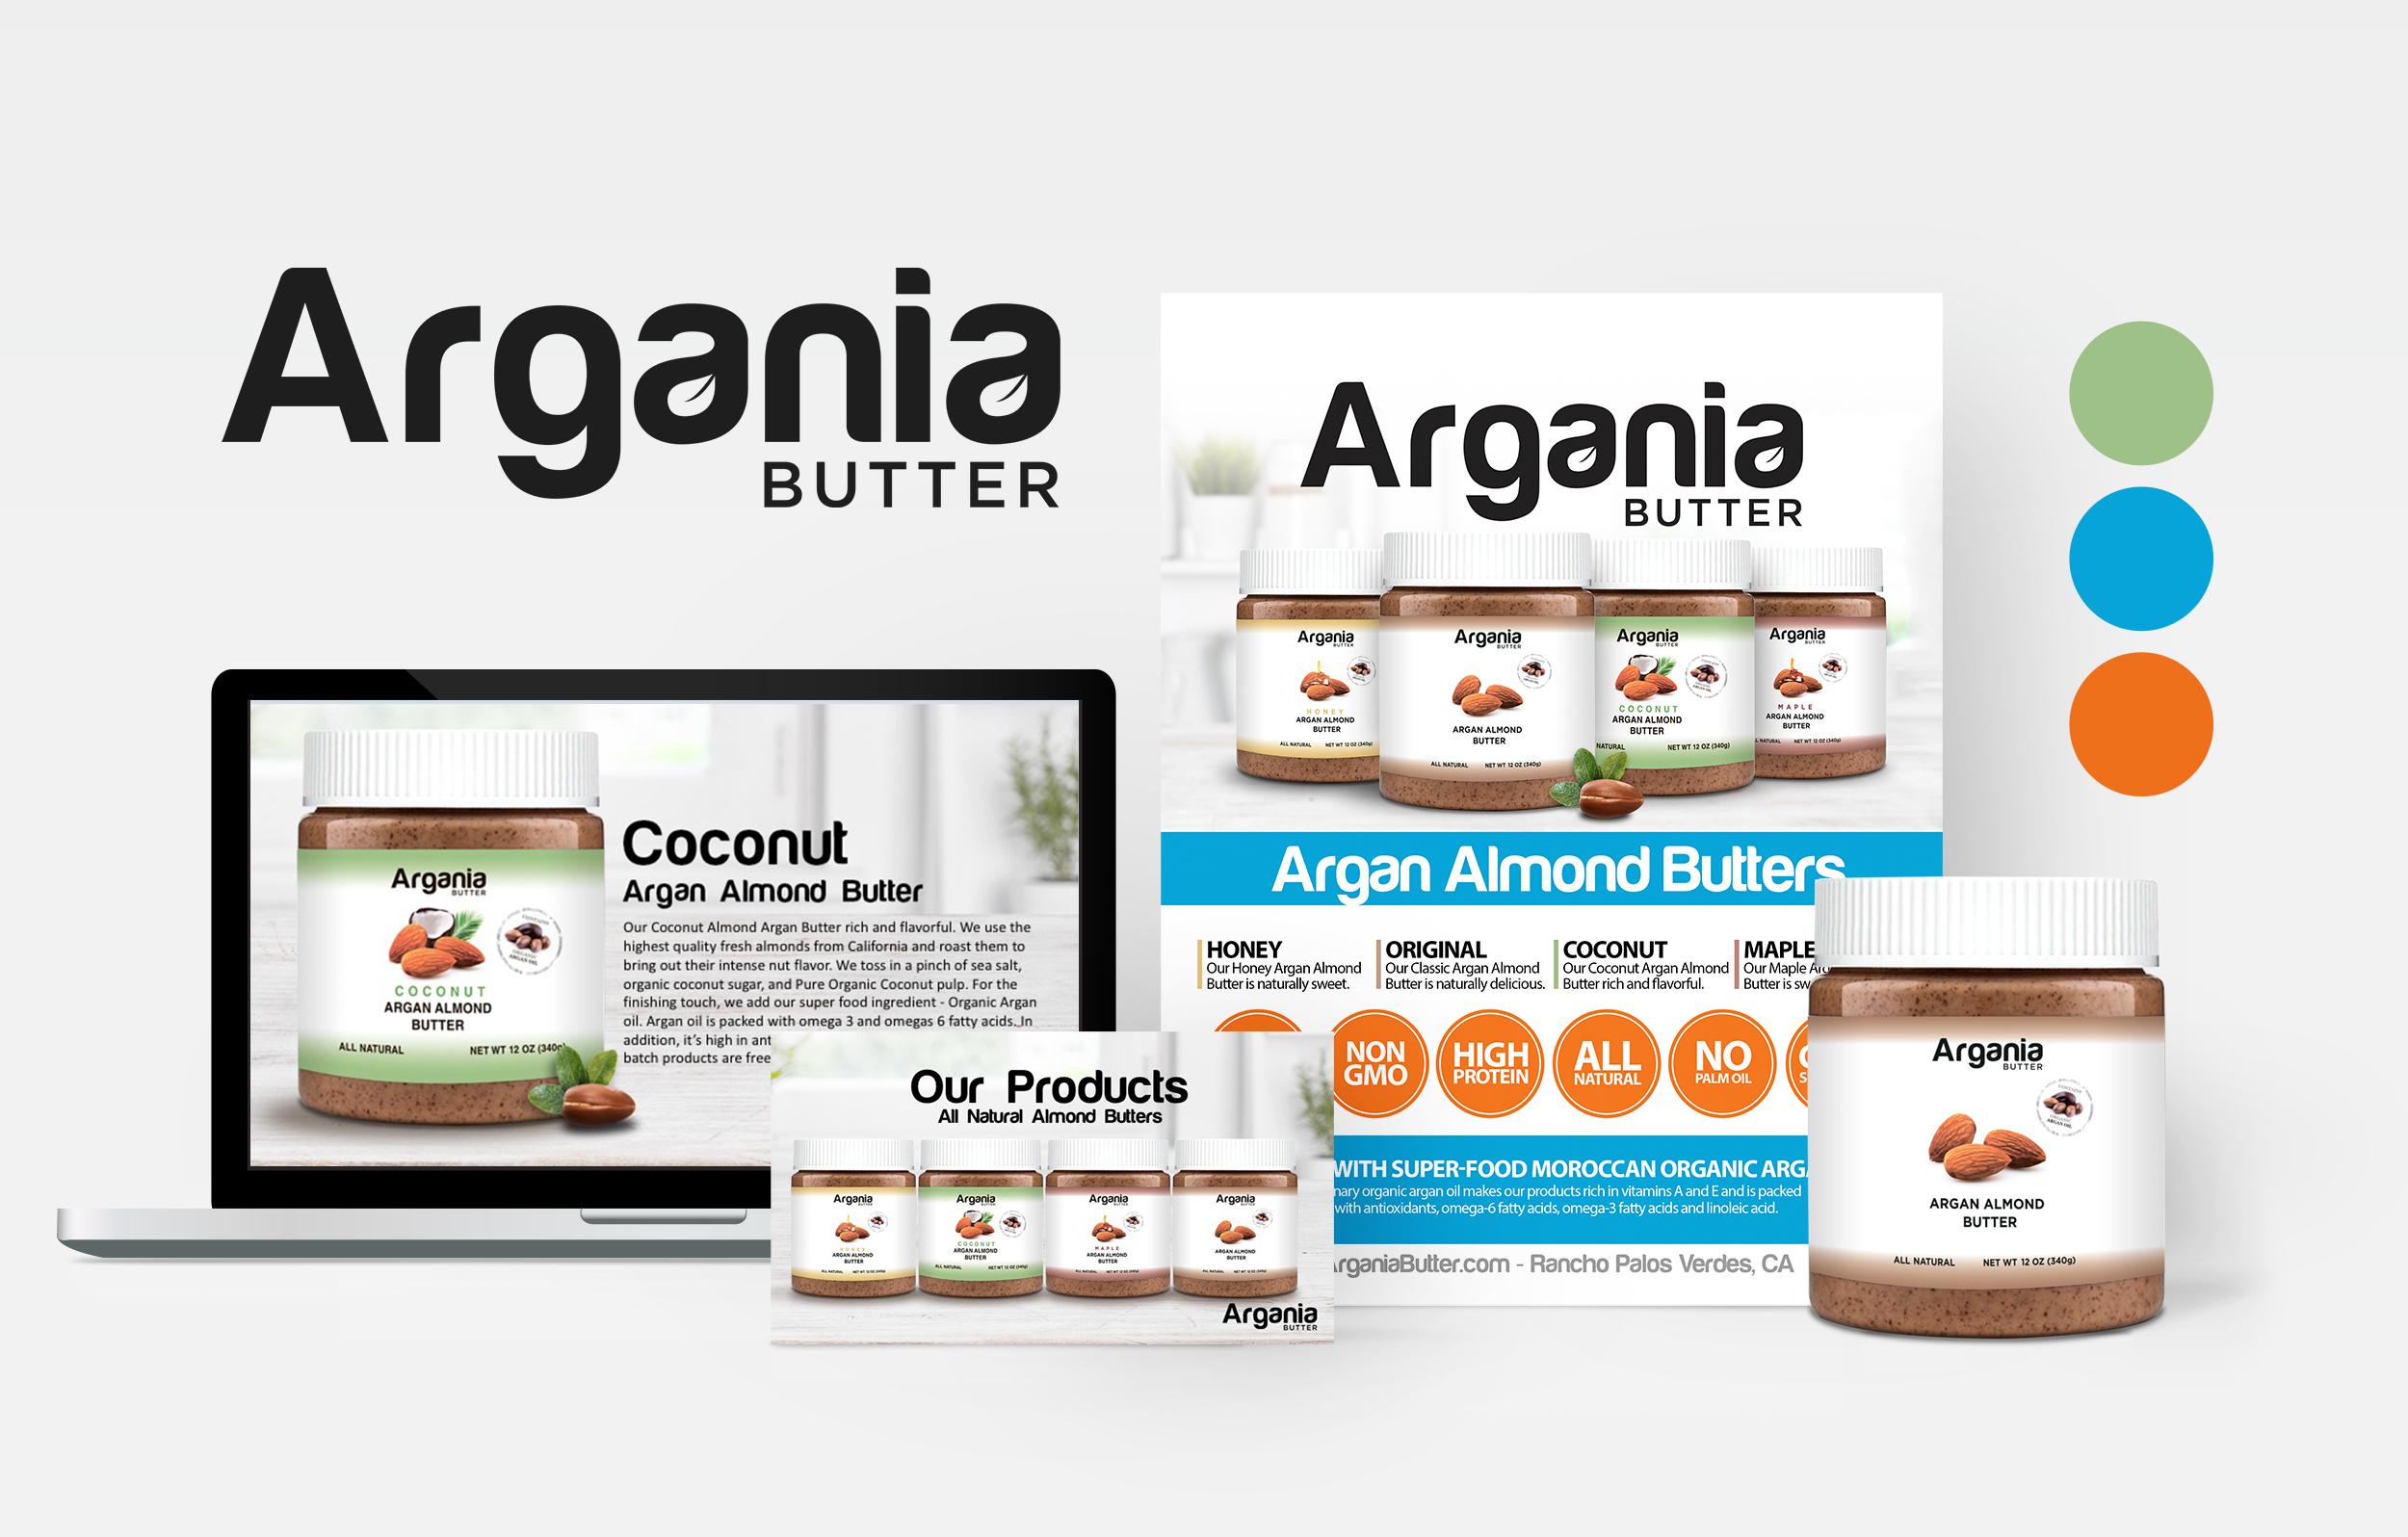 Morgan Overholt, Services, Argania Butter